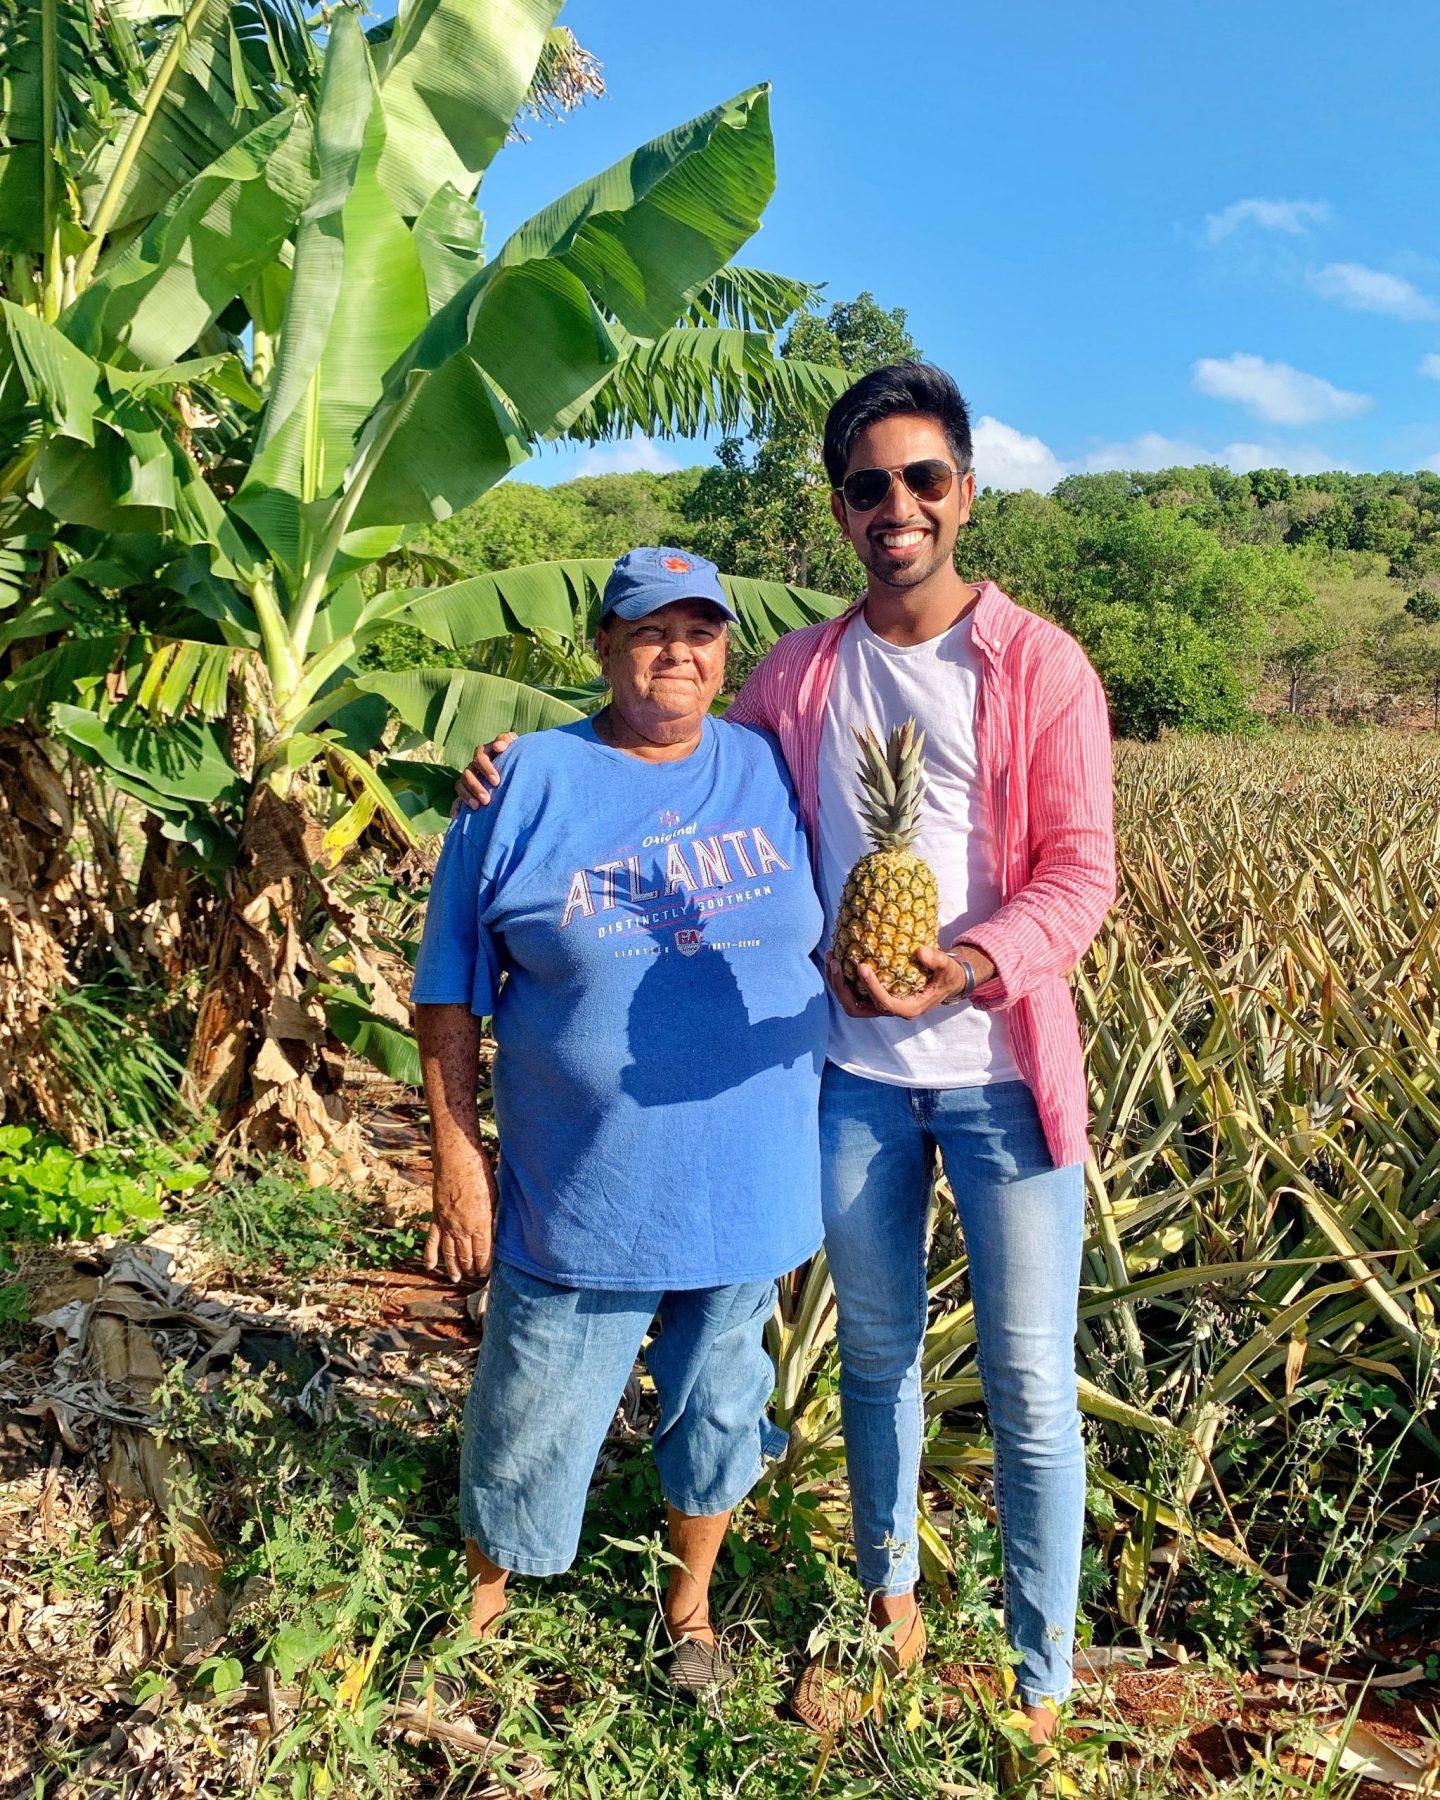 Lady Di's Pineapple Plantation, Eleuthera